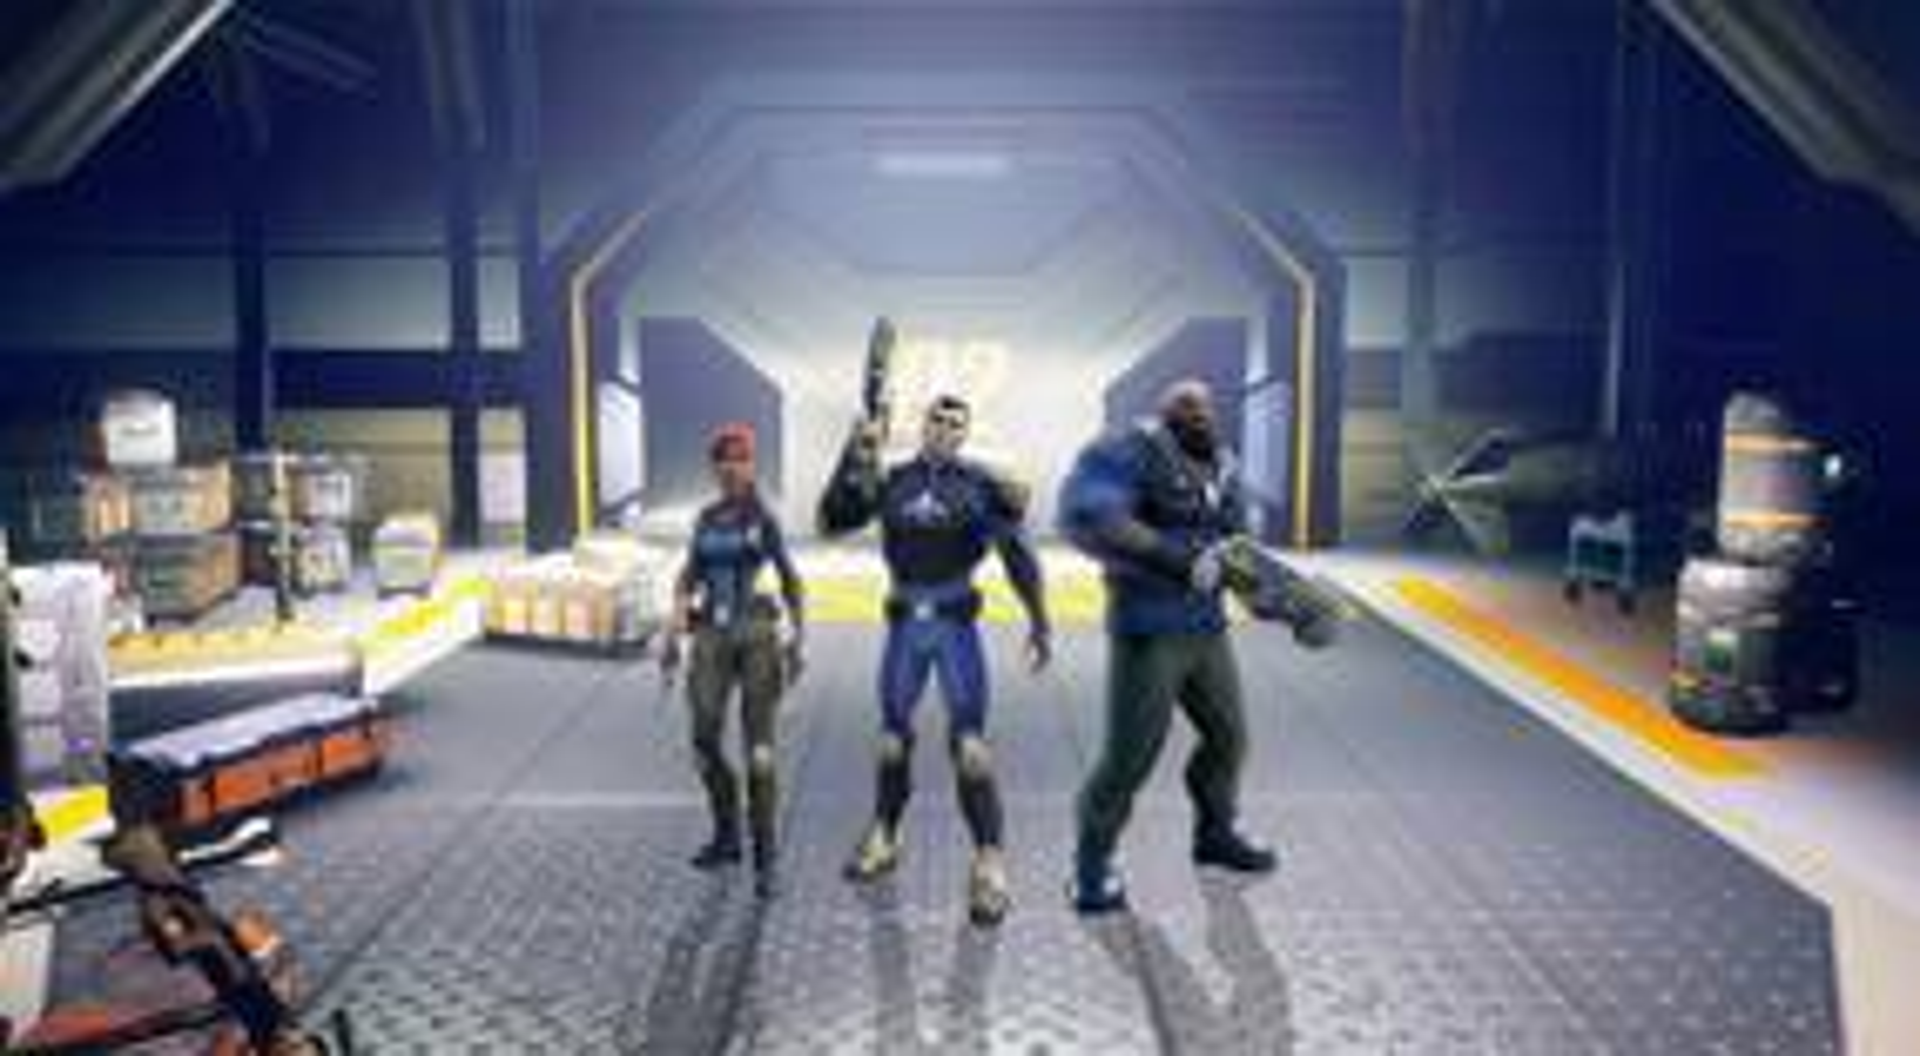 Image for Agents of Mayhem screenshots show cartoonish look